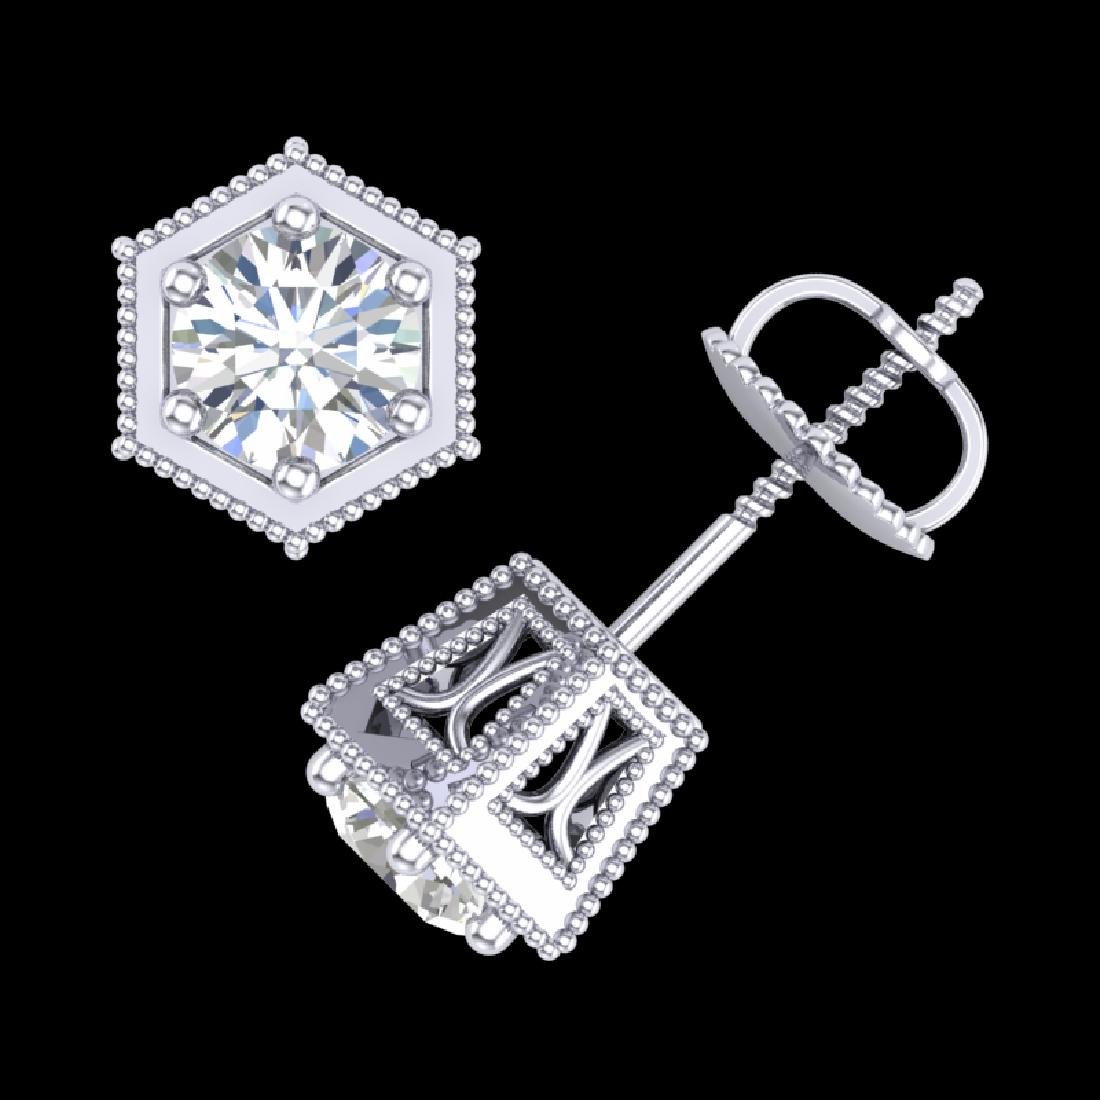 1.15 CTW VS/SI Diamond Solitaire Art Deco Stud Earrings - 3